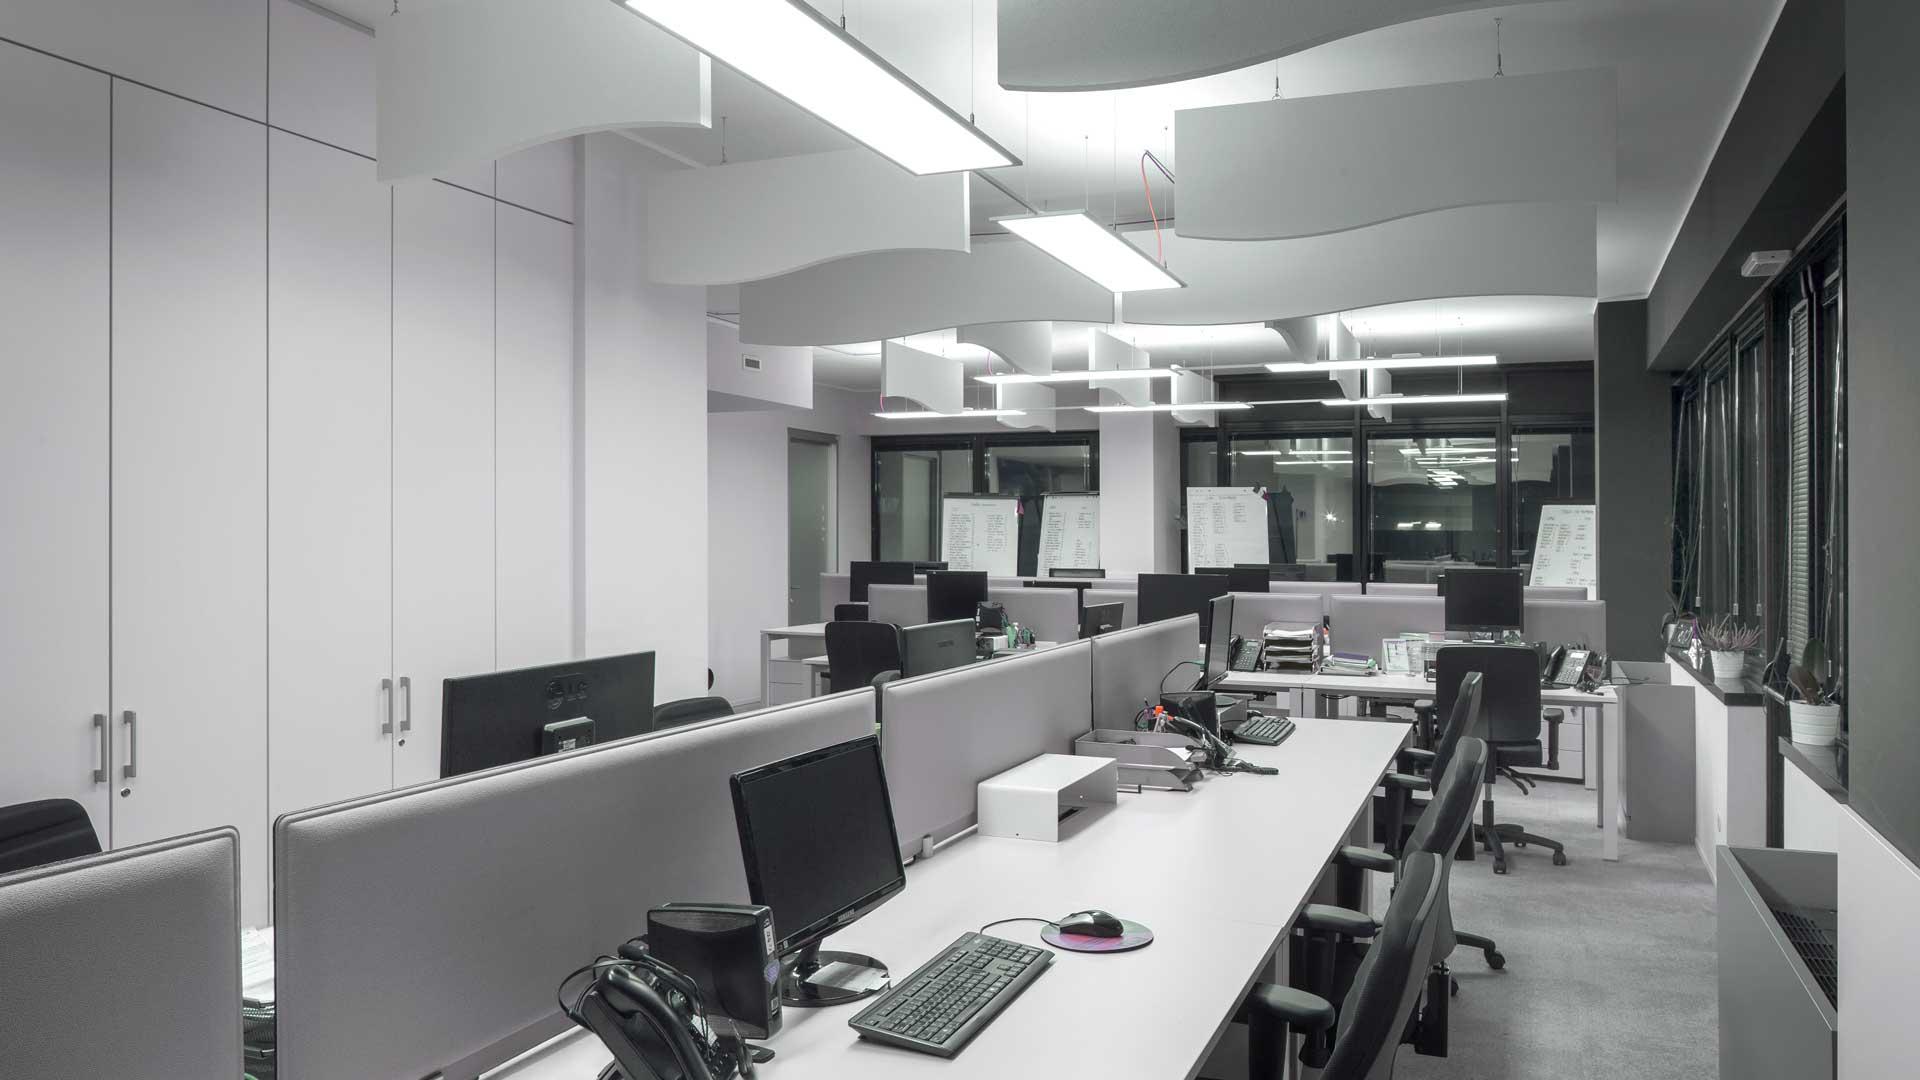 Uffici-per-e-commerce-Juice-Plus-Level-Office-Landscape